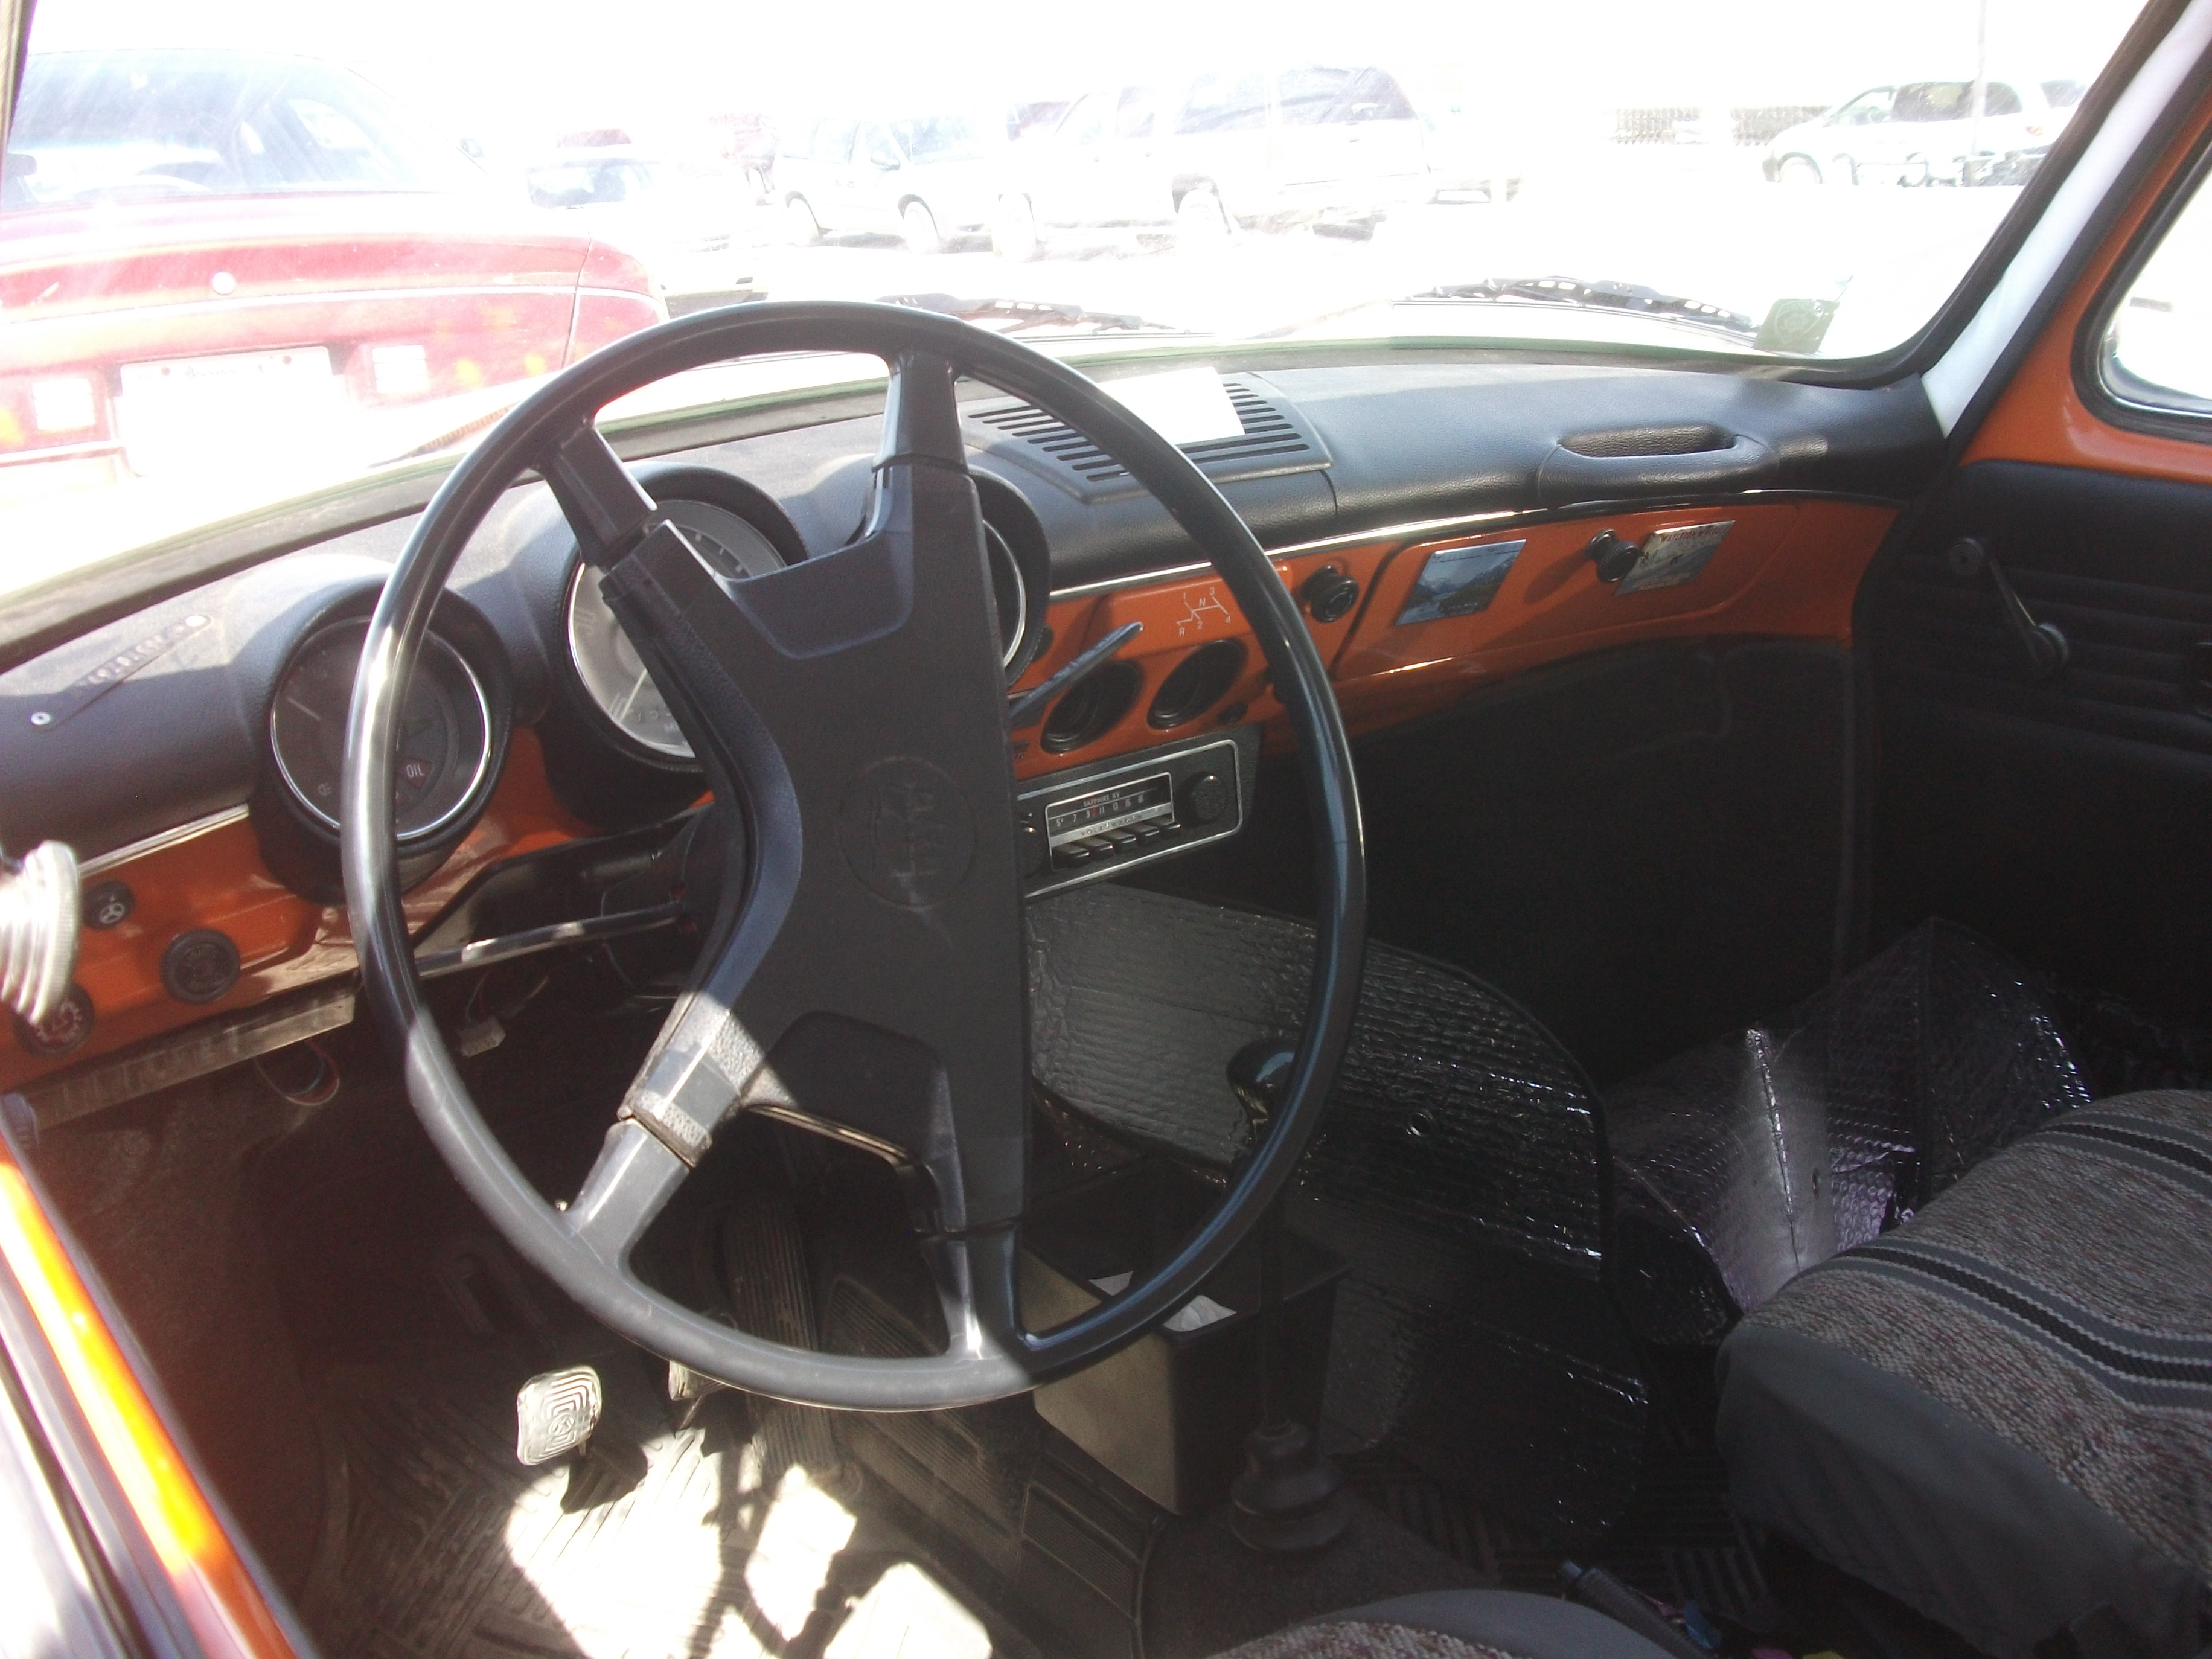 File:Volkswagen Squareback Type 3 interior (7106069777).jpg